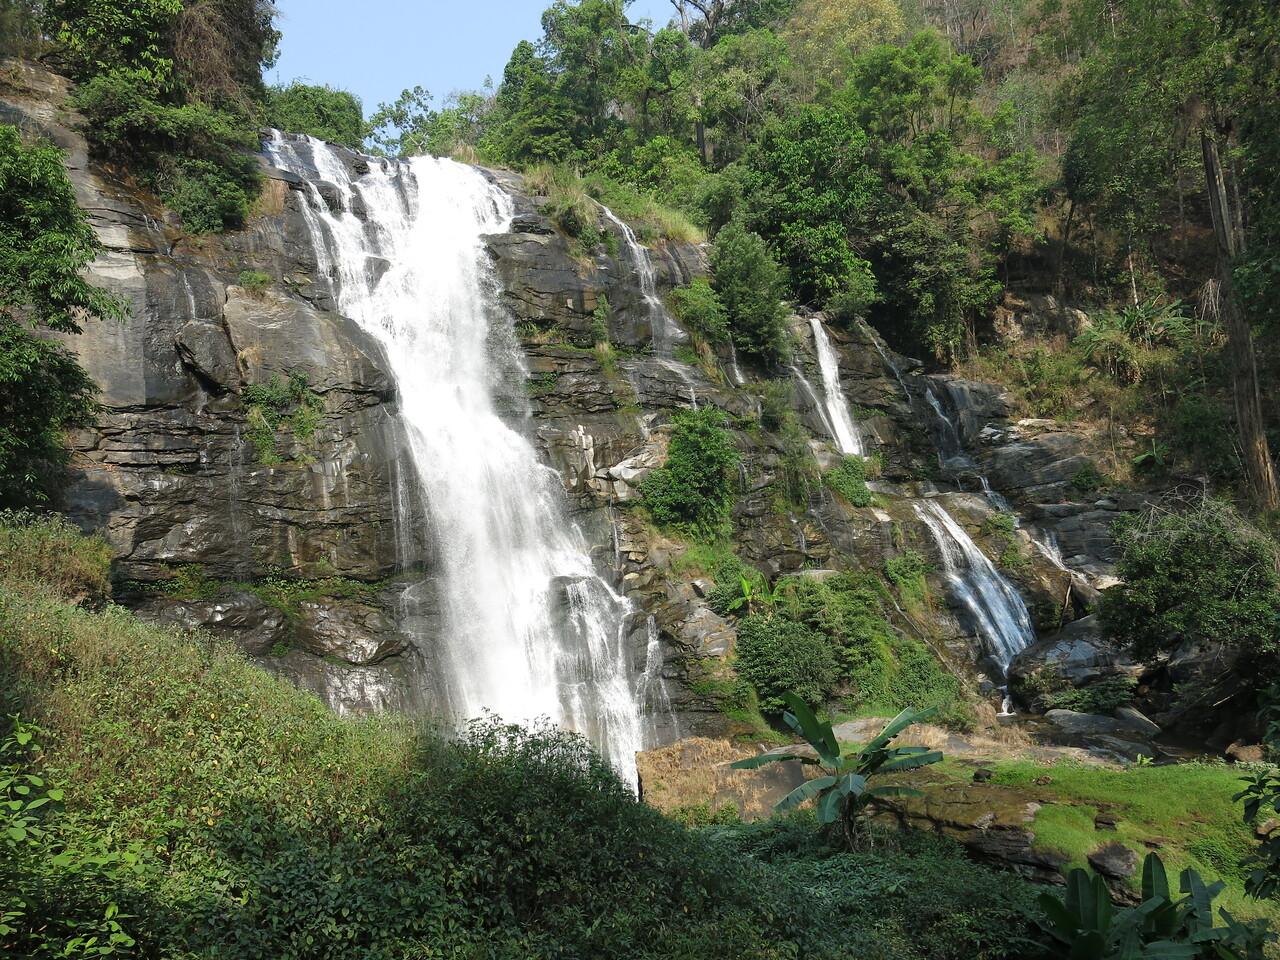 Wachiratan Falls